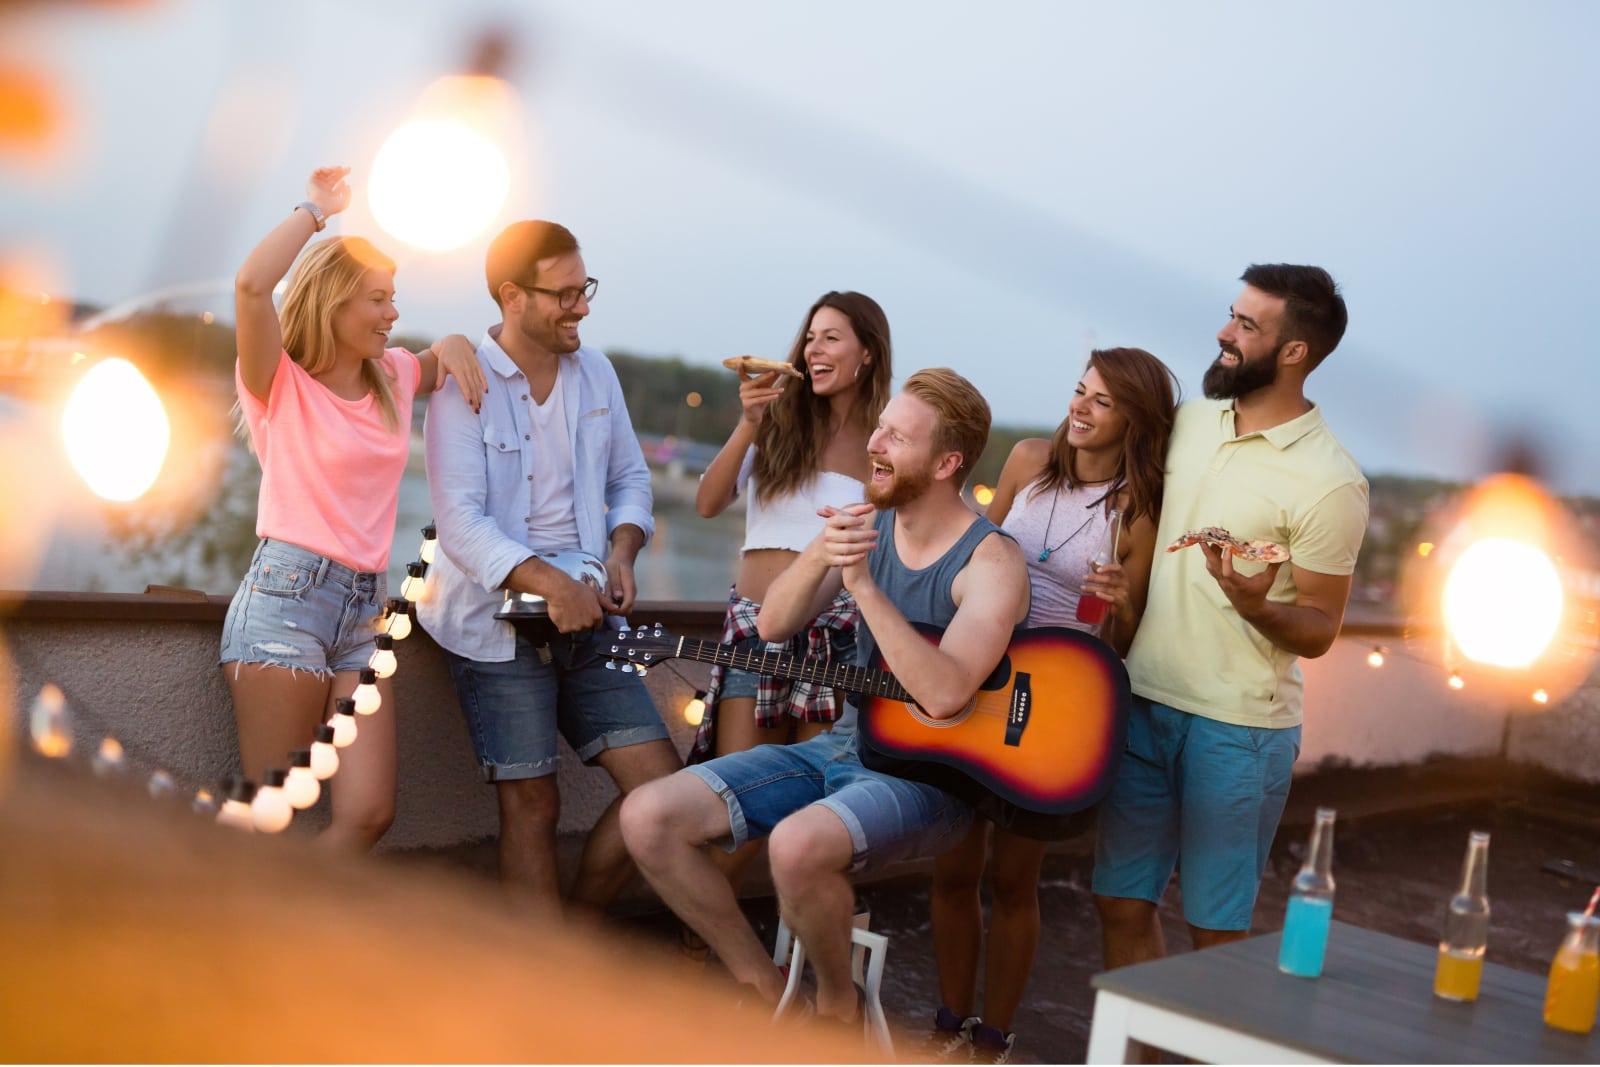 friends having fun outdoors